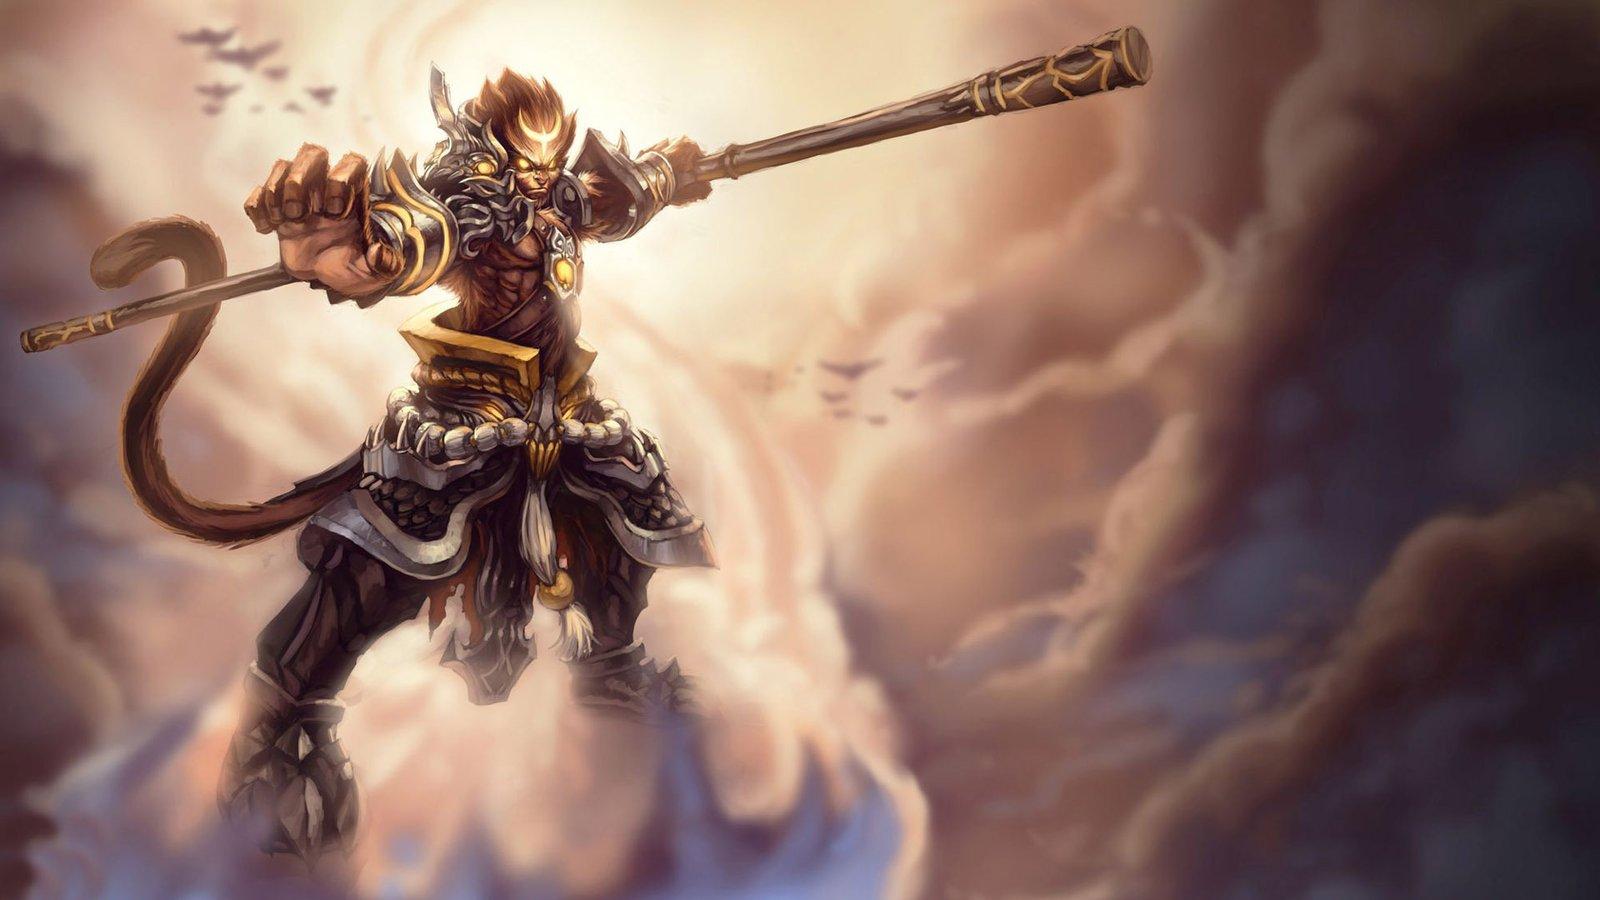 Wukong League Of Legends Wallpaper HD 1920x1080 1